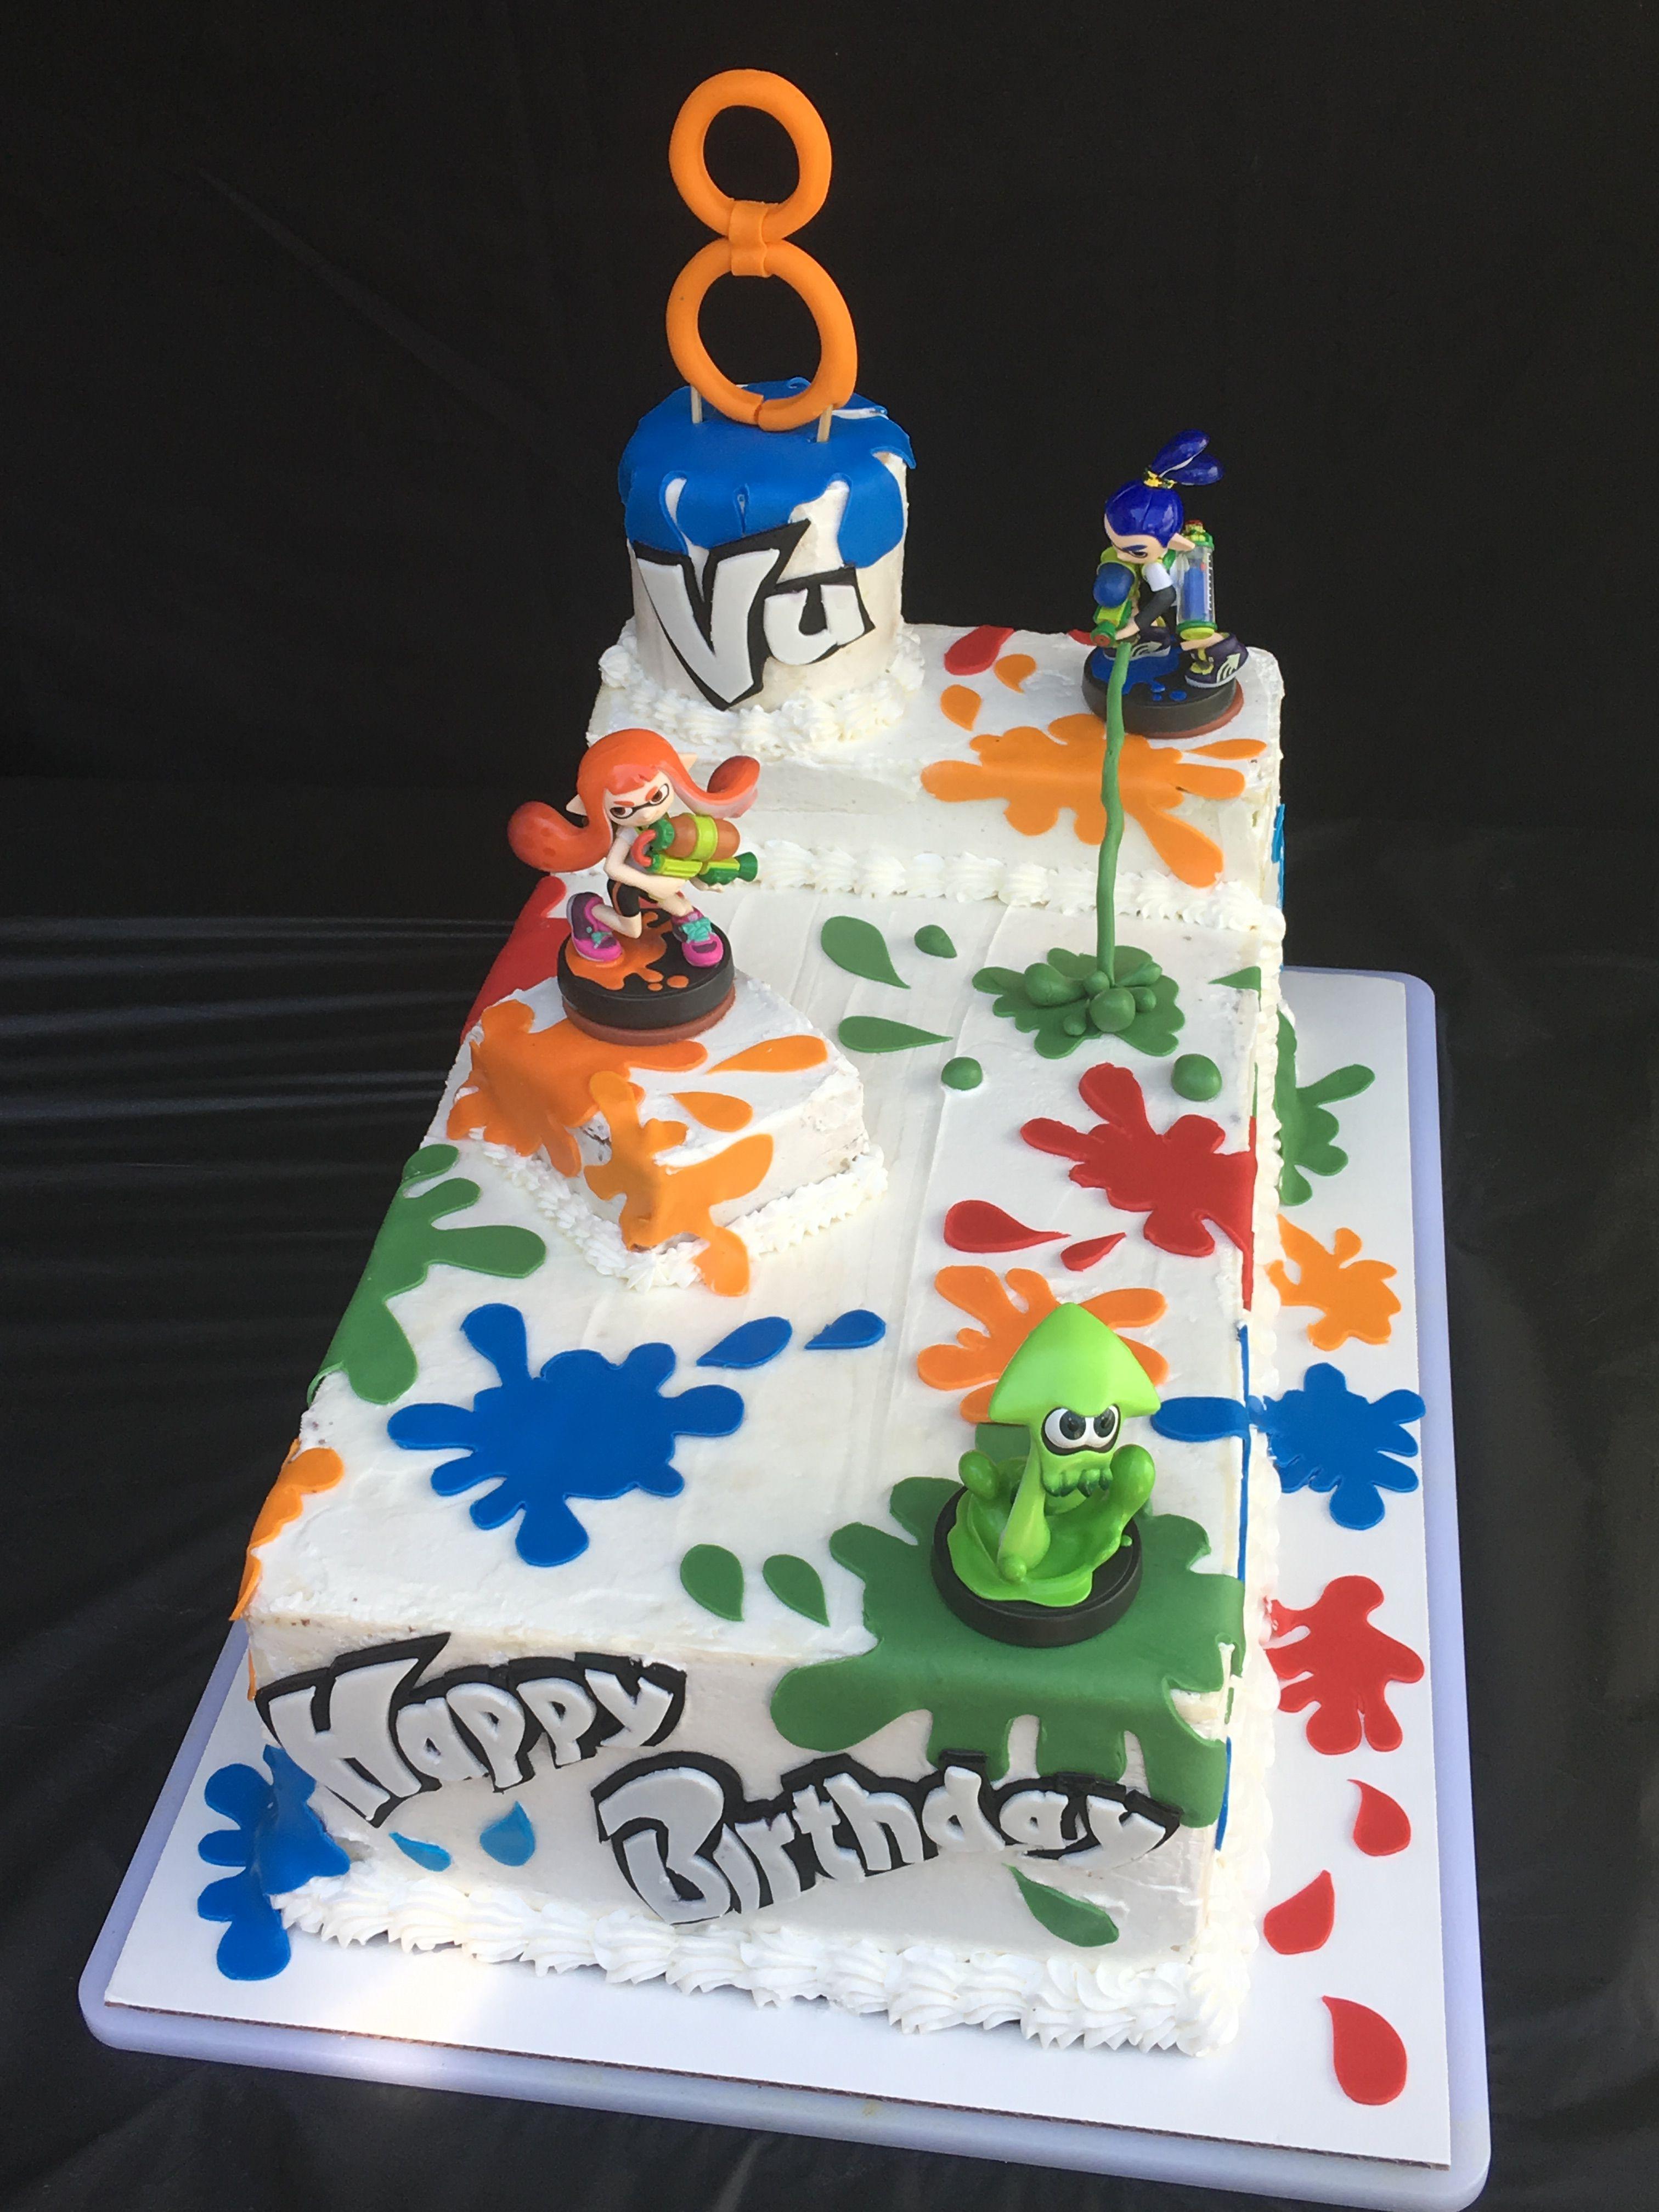 8th Birthday Cake Splatoon Cake In 2019 8th Birthday